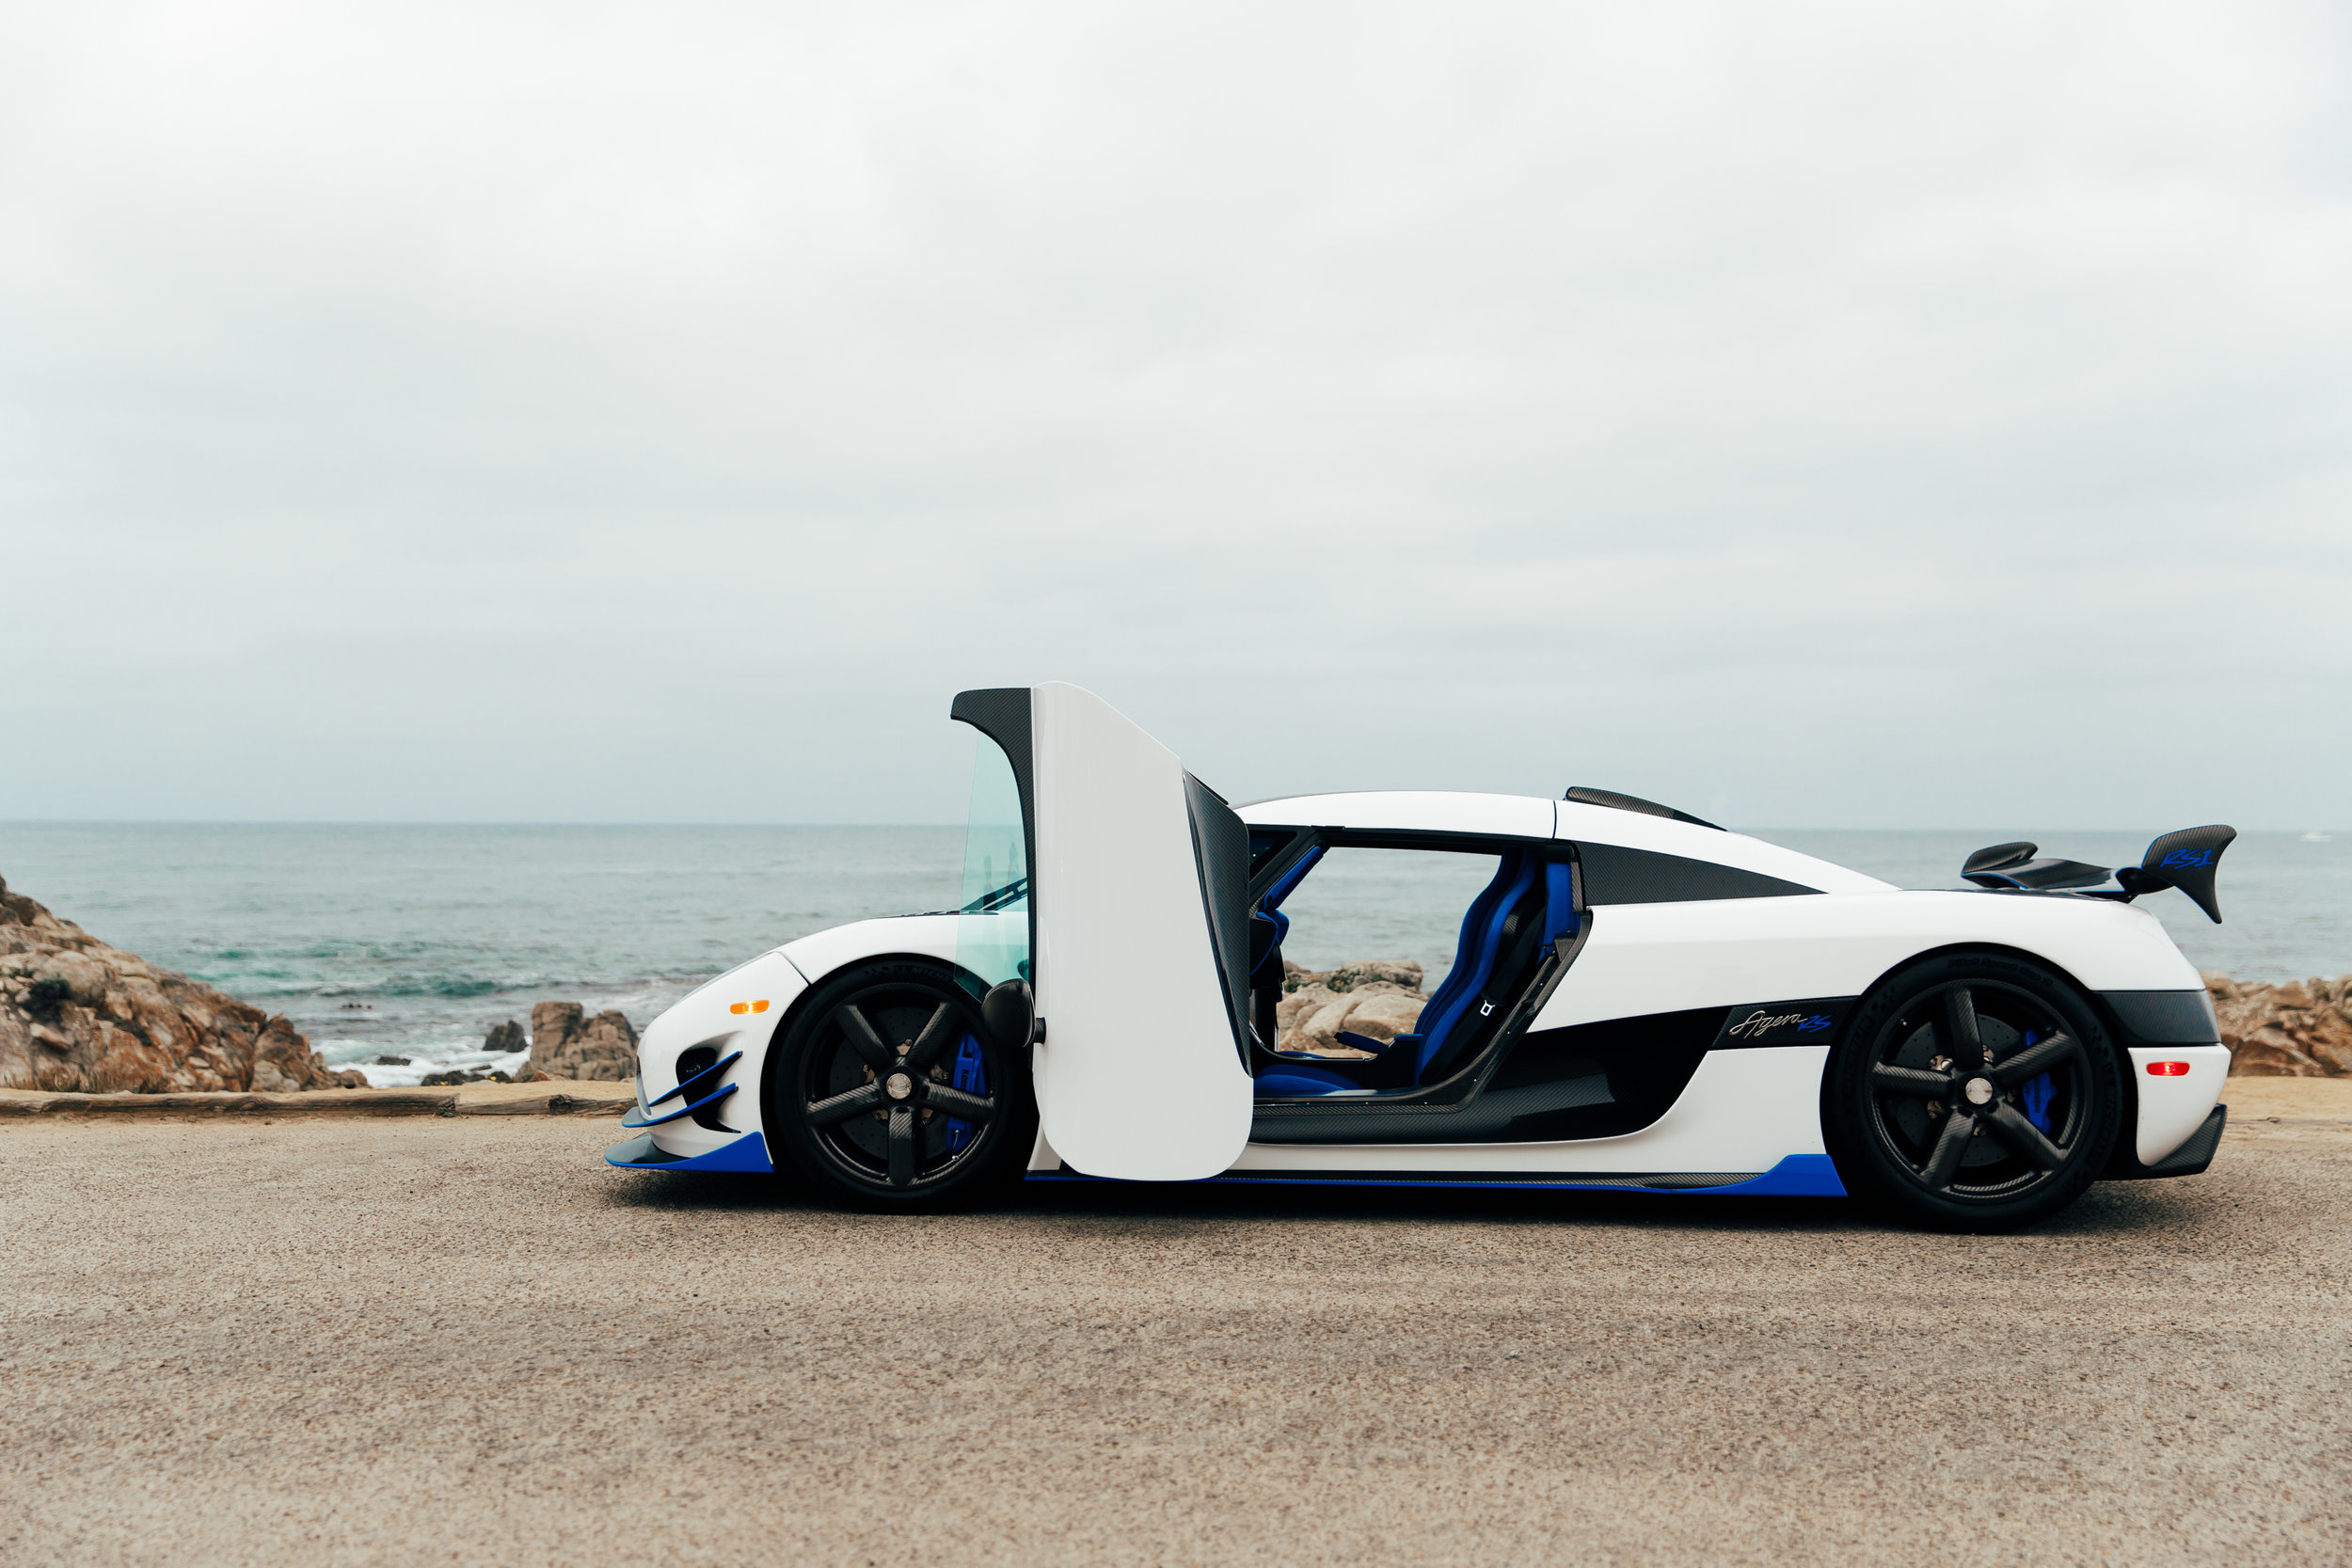 Stay_Driven_Monterey_Car_Week_Whitesse_Koenigsegg-34.jpg